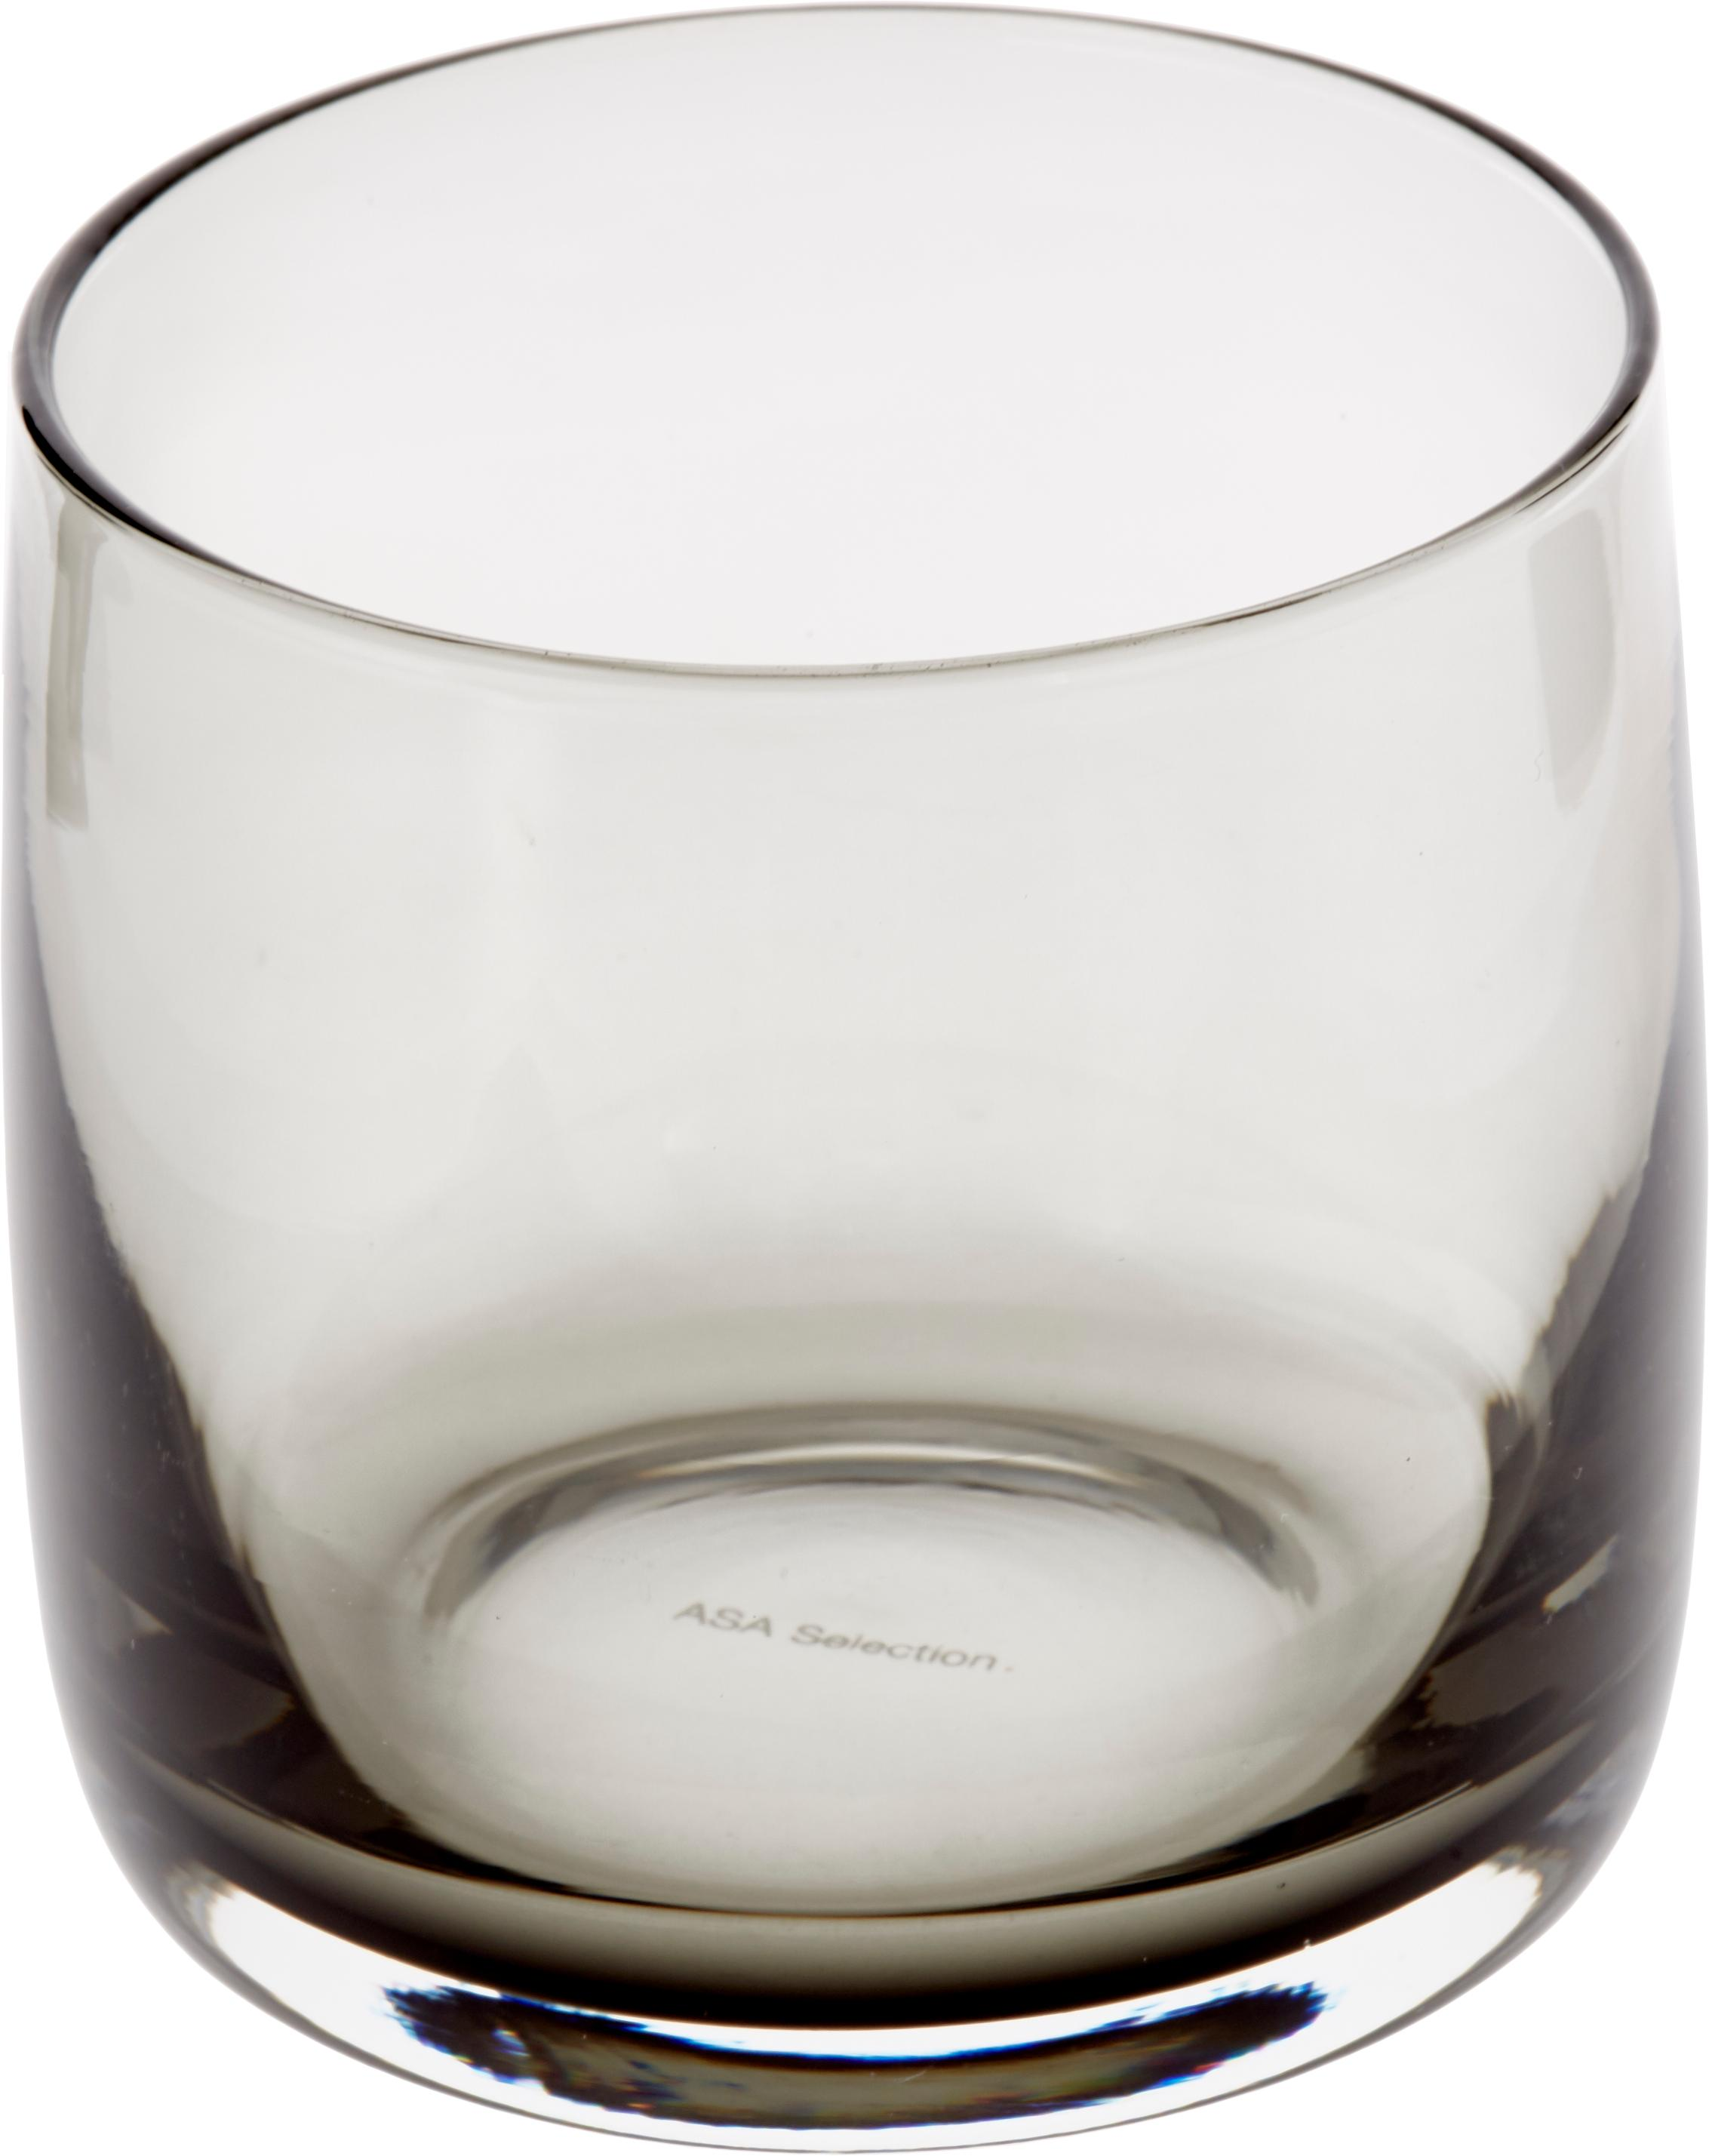 Bicchiere acqua Colored 6 pz, Vetro, Grigio trasparente, Ø 8 x Alt. 8 cm